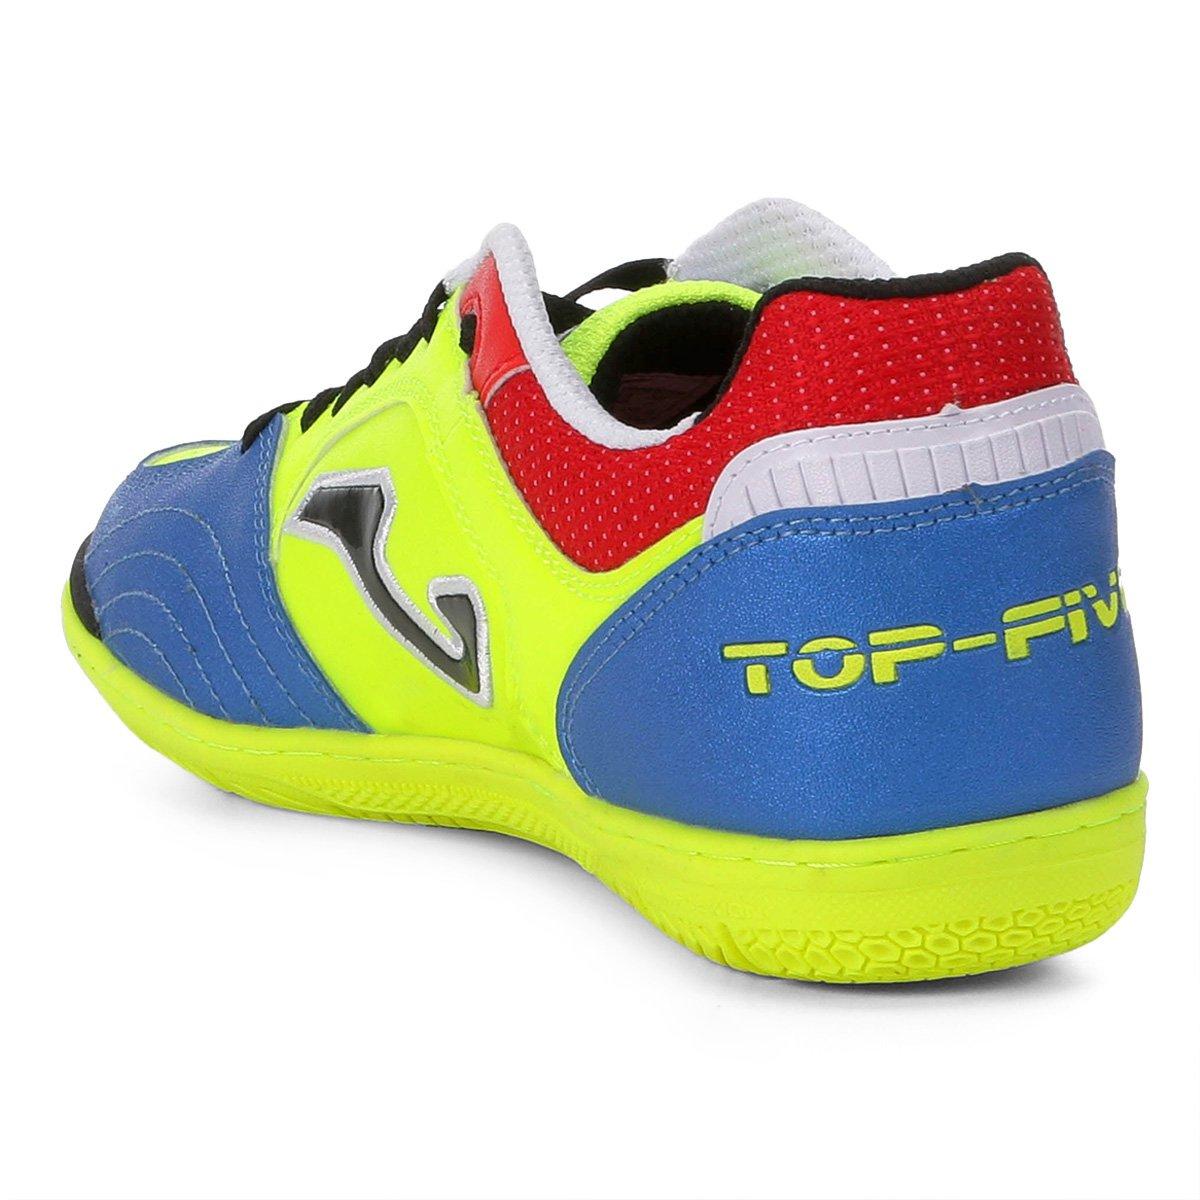 Chuteira Futsal Joma Top Five IN - Verde - Compre Agora  1ea5b8d099815